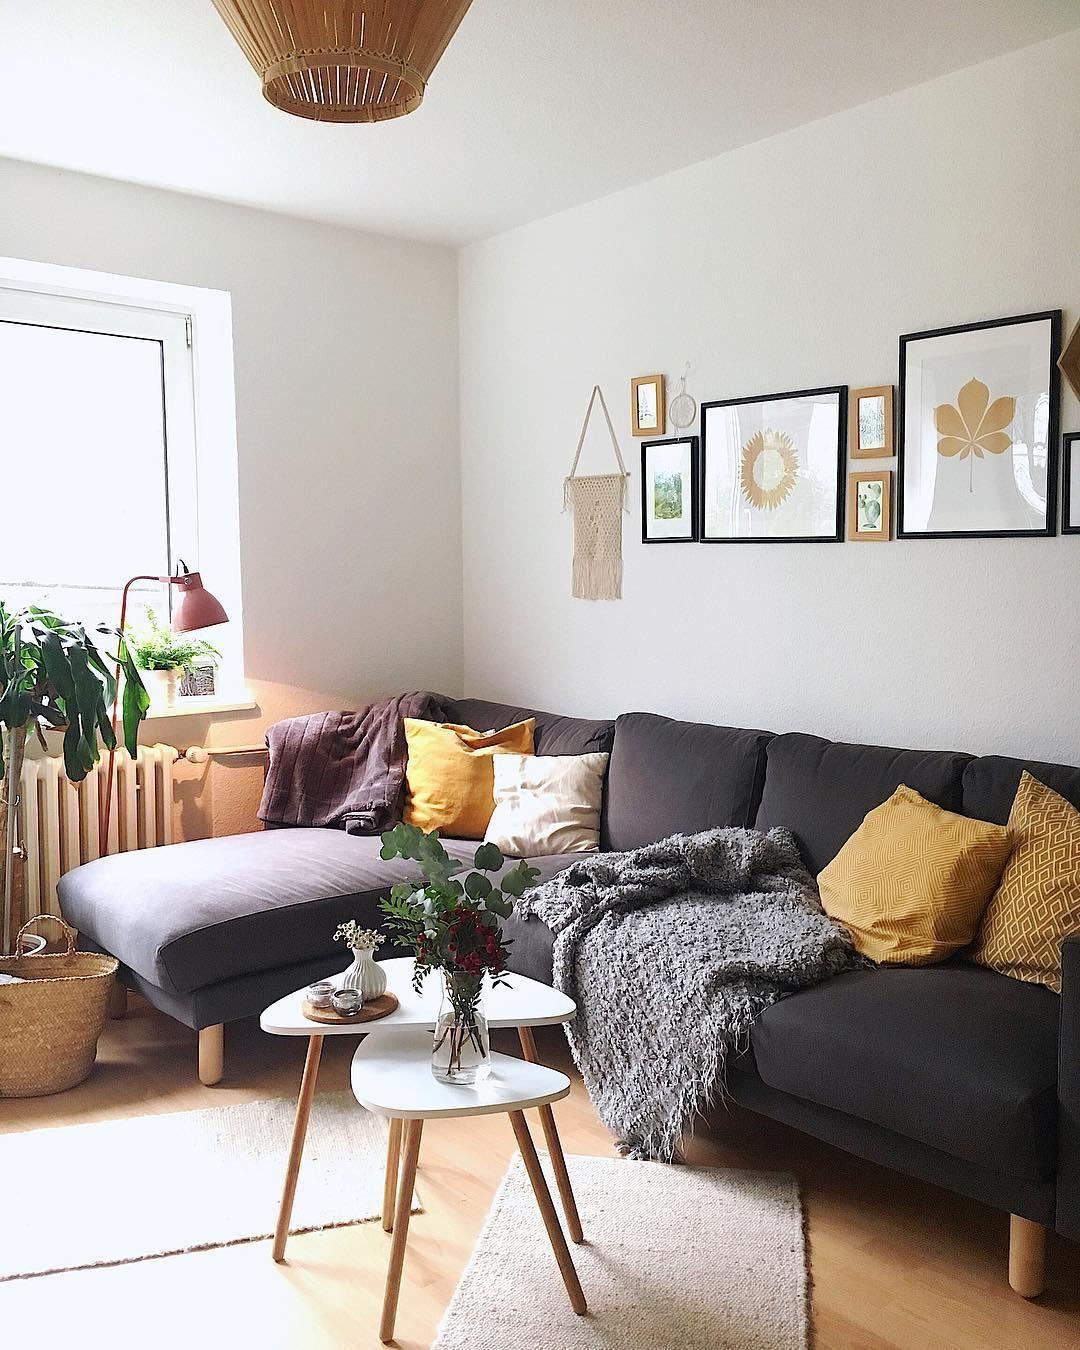 Couchtisch Venus   Venus, Apartments and Living rooms